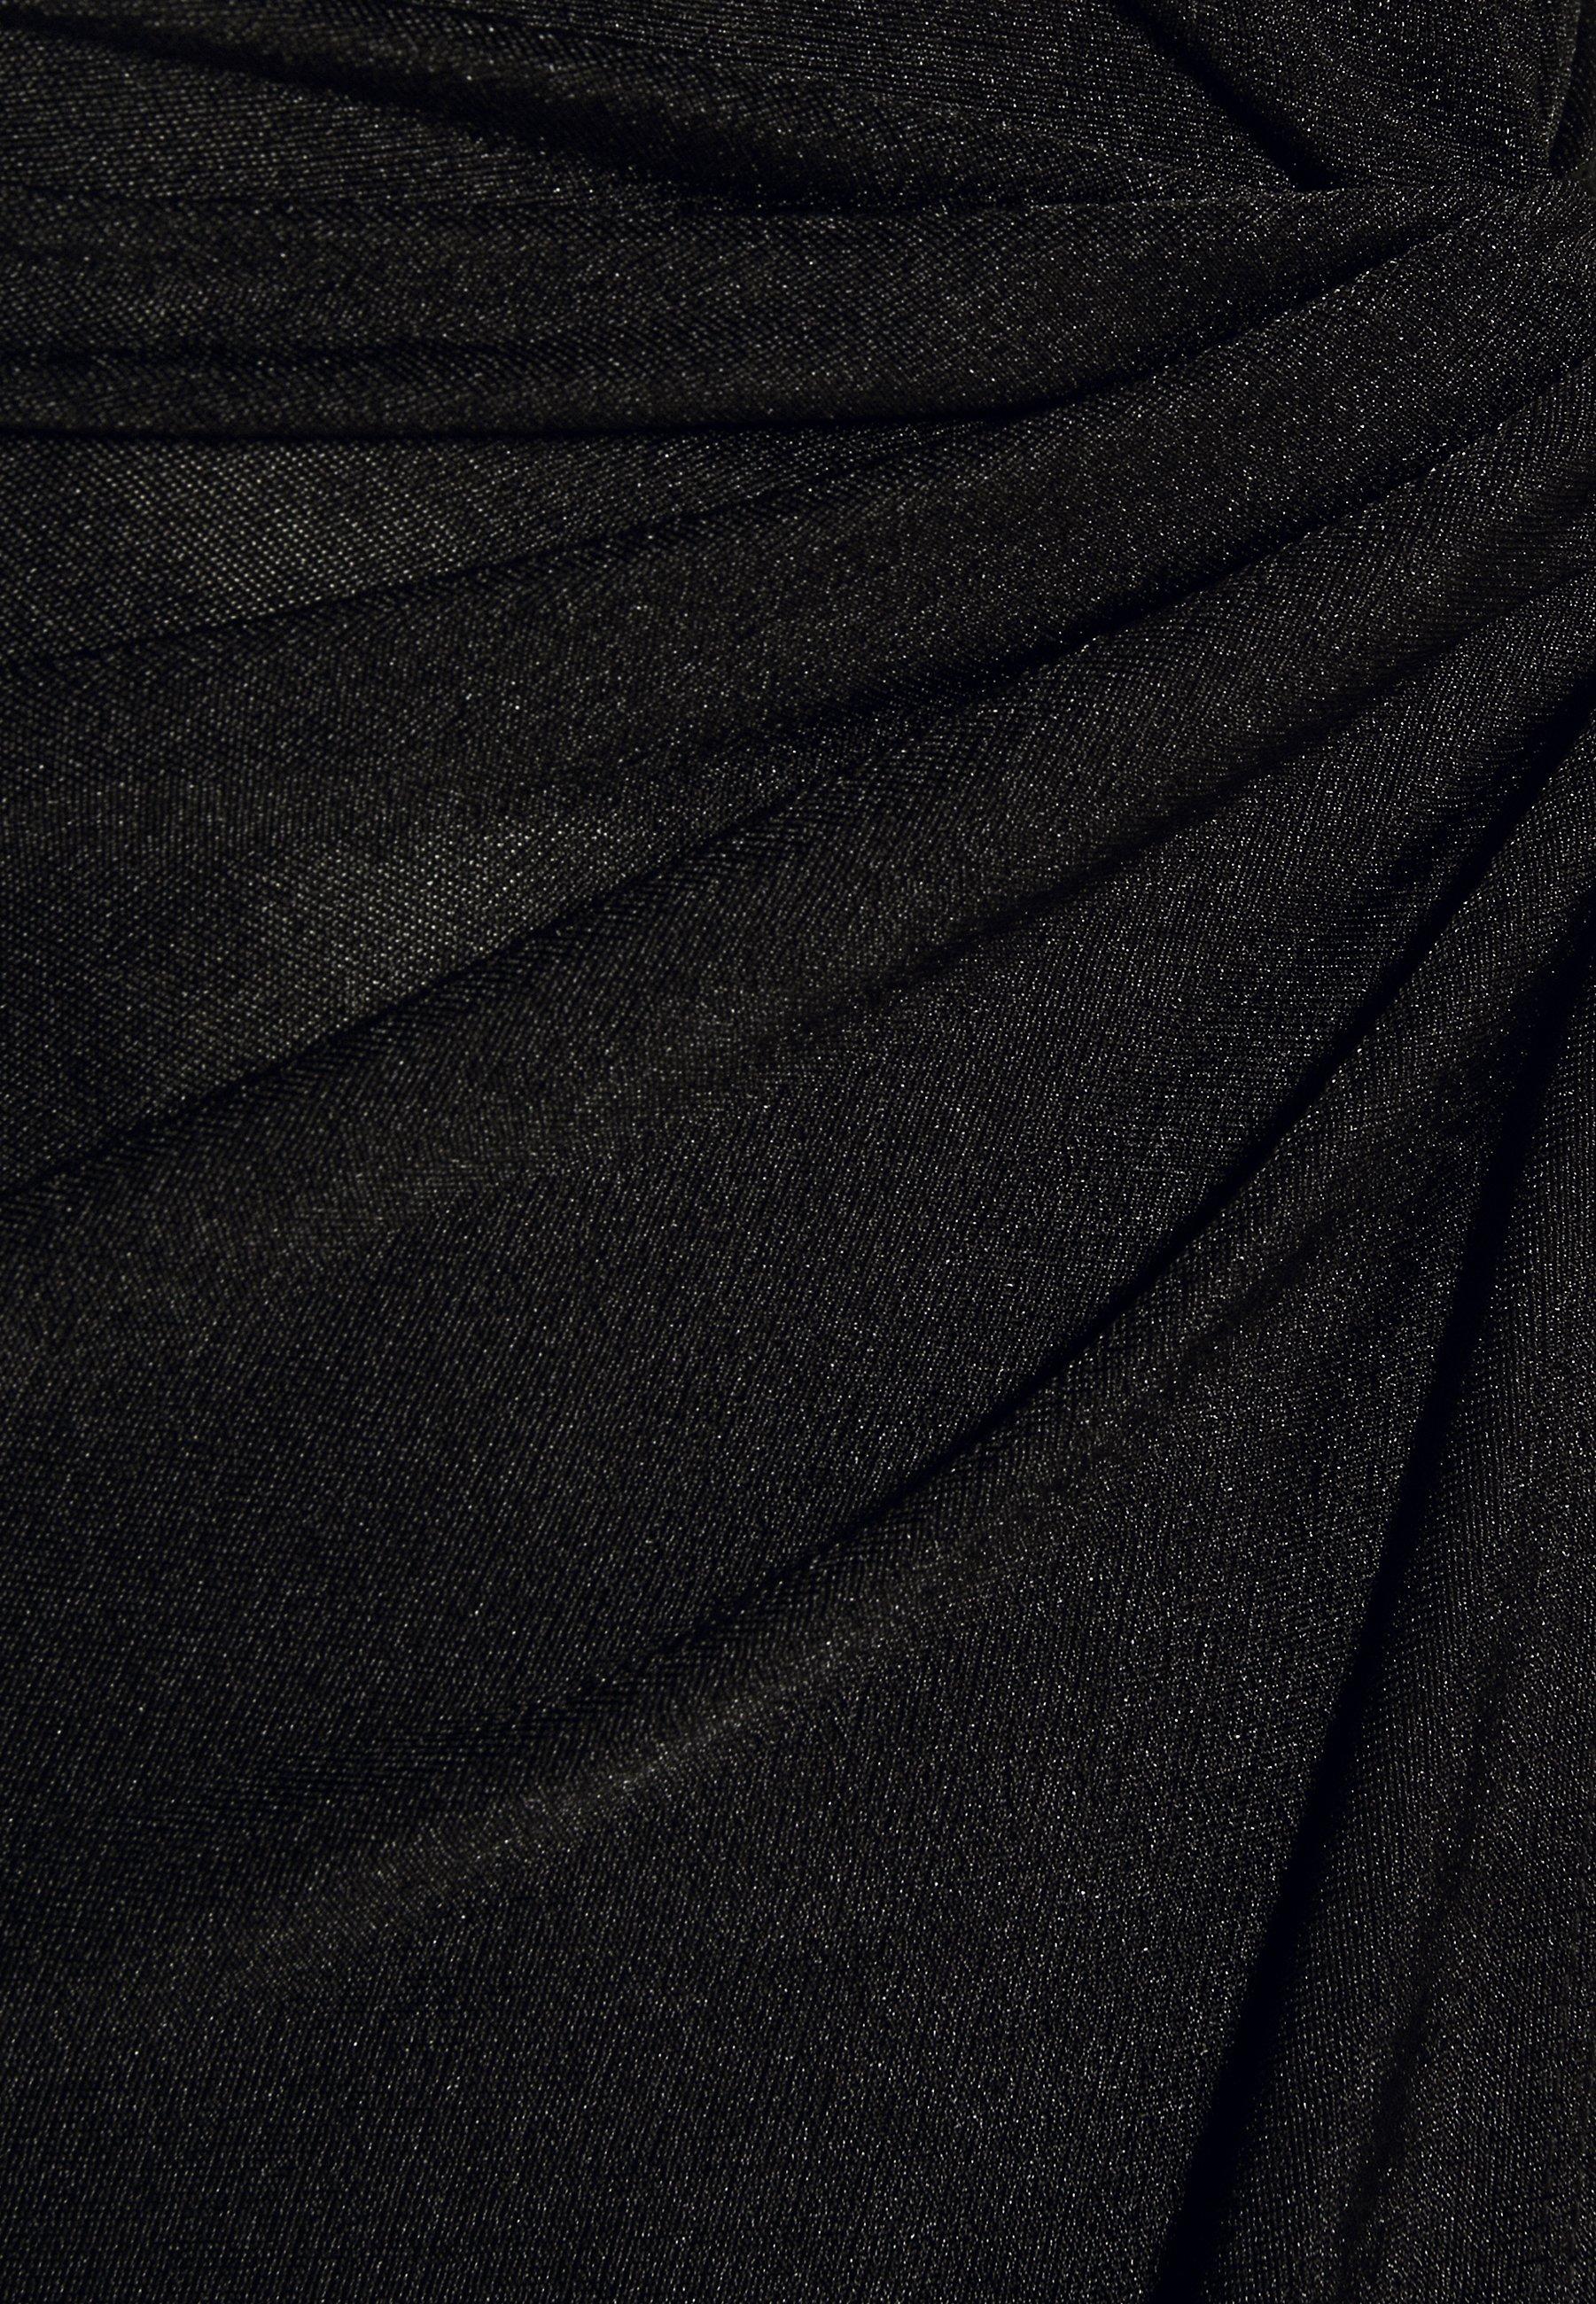 WAL G. KNOT TIE MIDI DRESS Freizeitkleid black/shimmer/schwarz